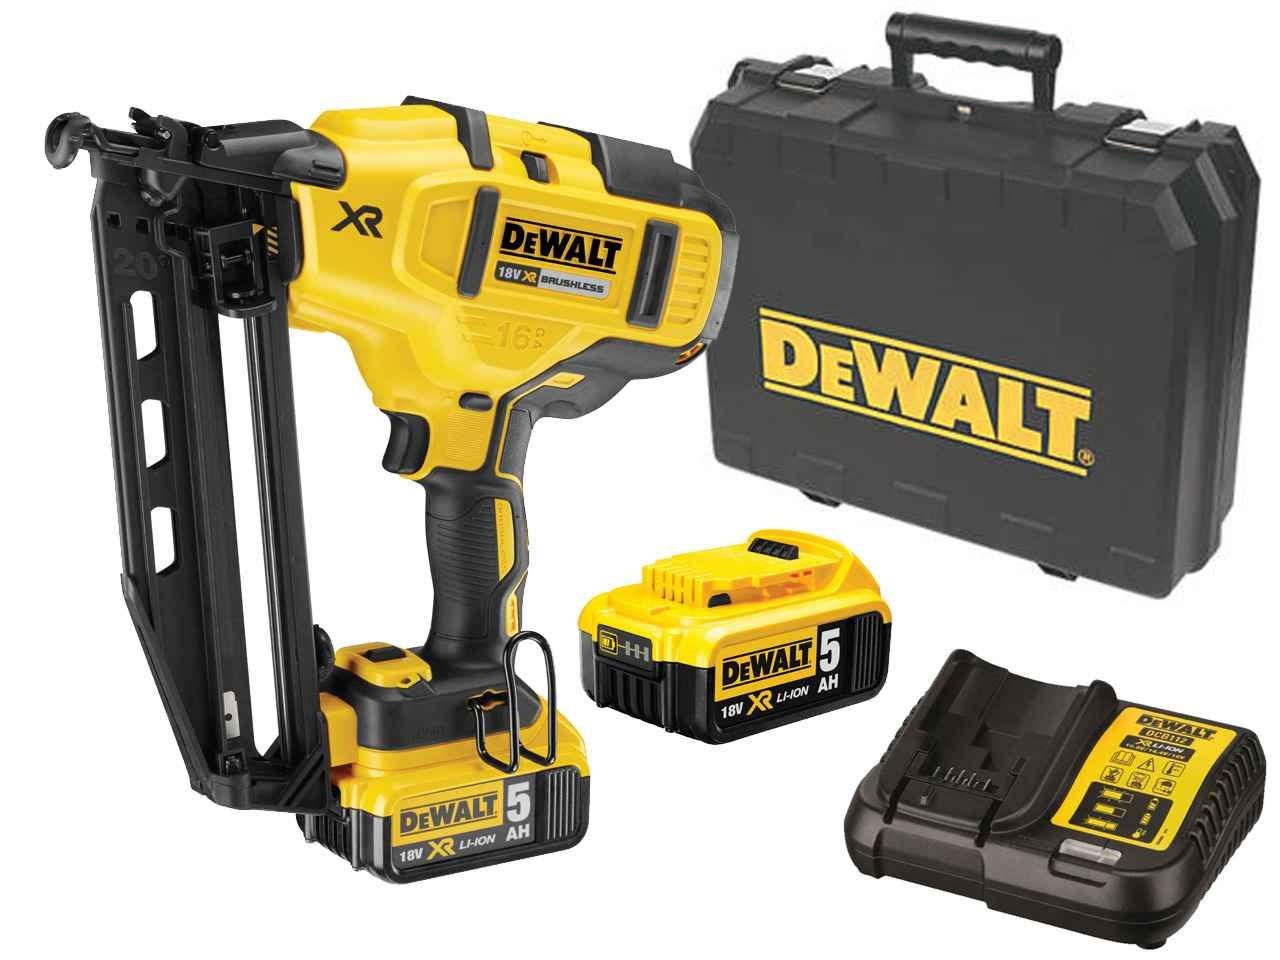 DeWalt DCN660P2 18v XR Brushless Second Fix Angled Nailer 2 x 5.0Ah ...